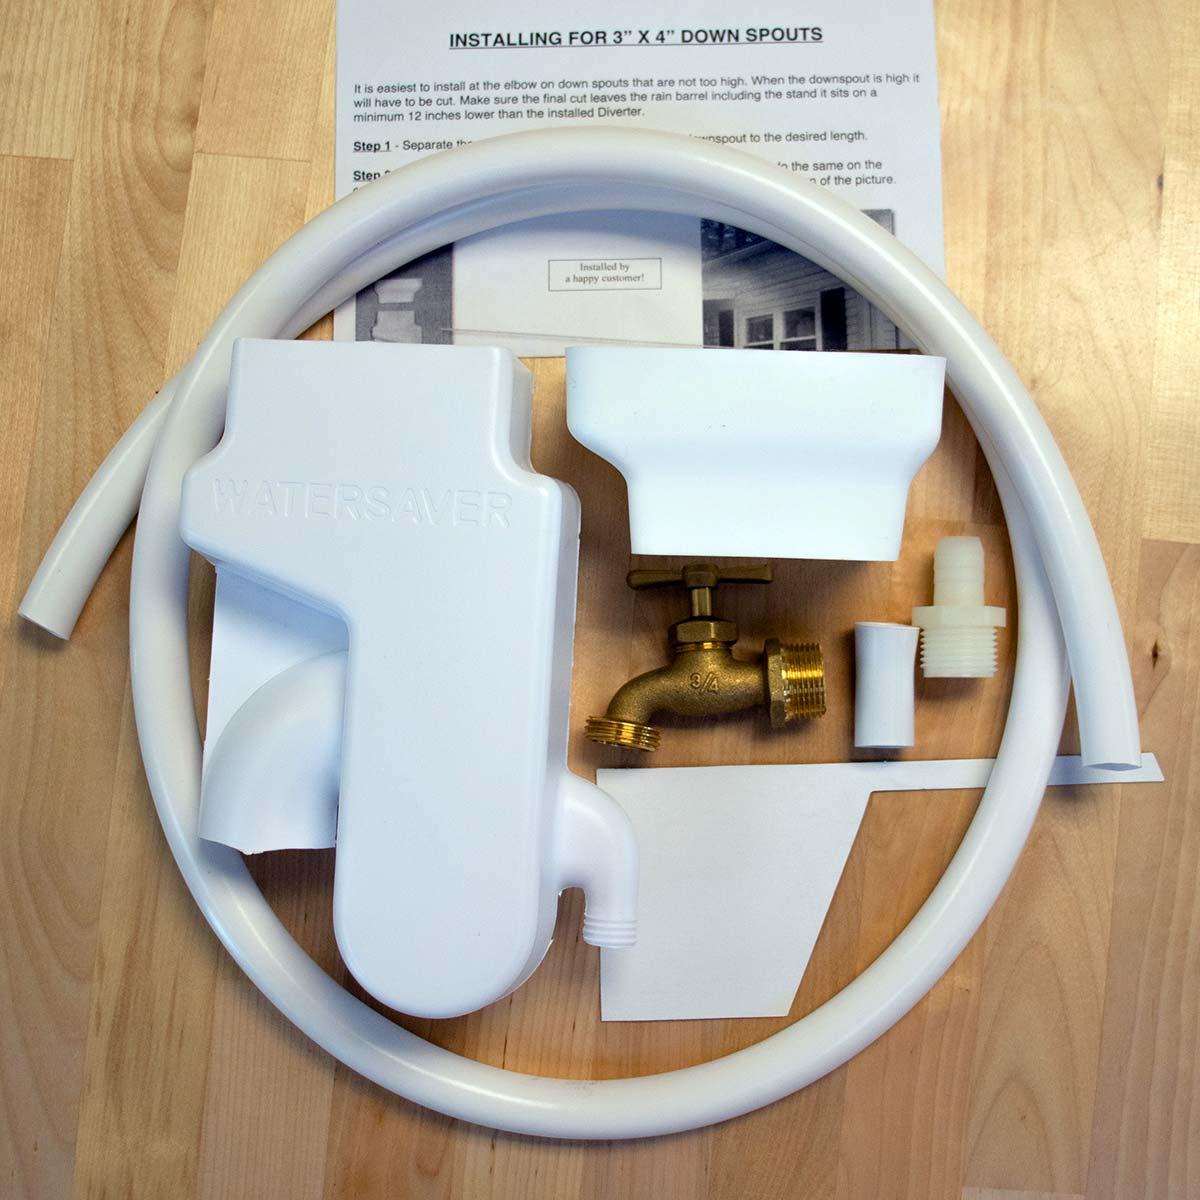 Garden Watersaver Complete Rainbarrel Kit for 3x4 in Downspouts